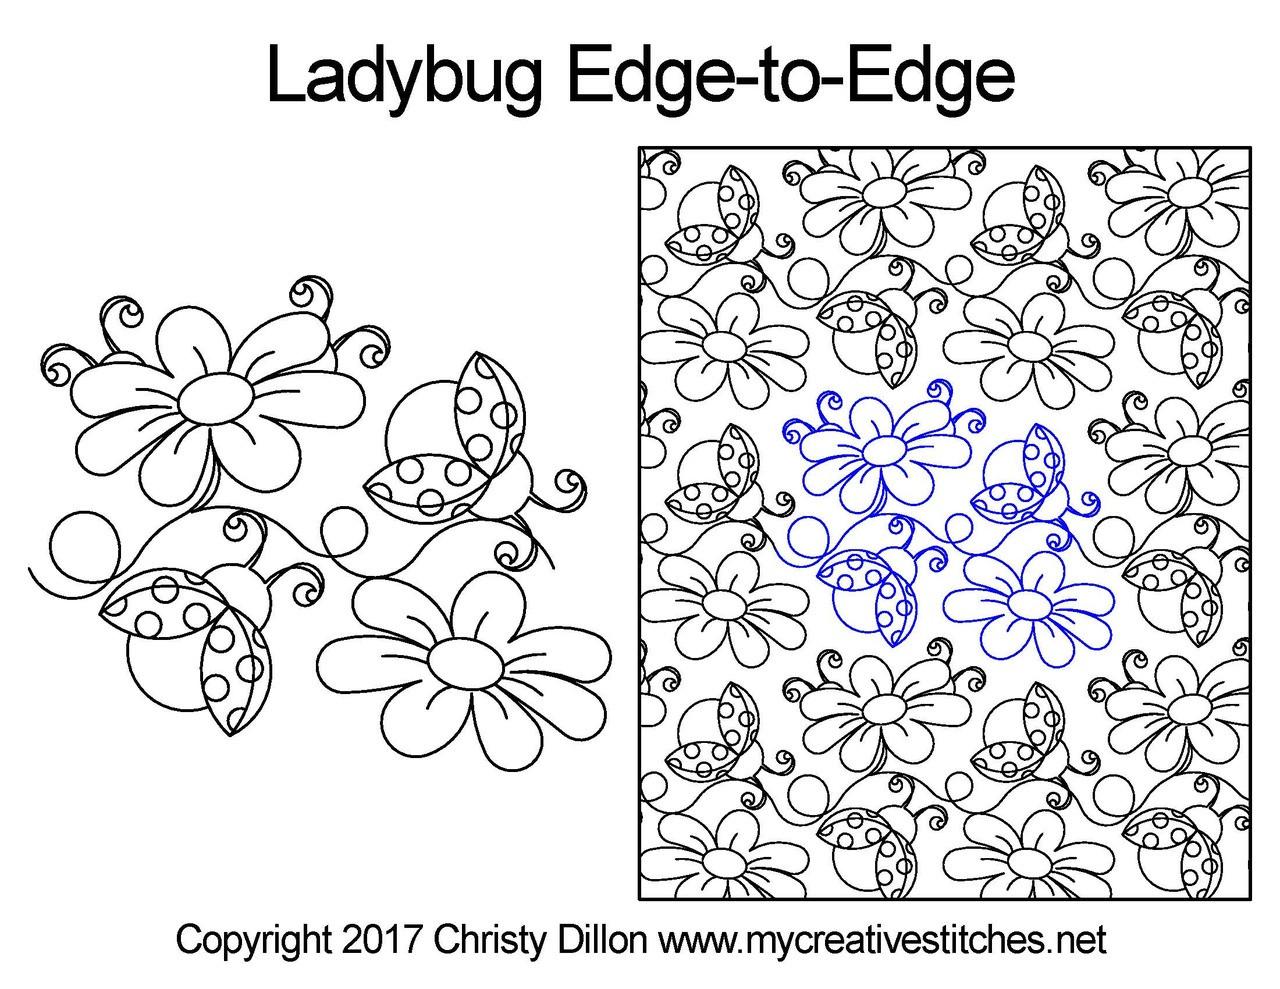 Computerized Quilting Patterns Ladybug Edge-to-Edge